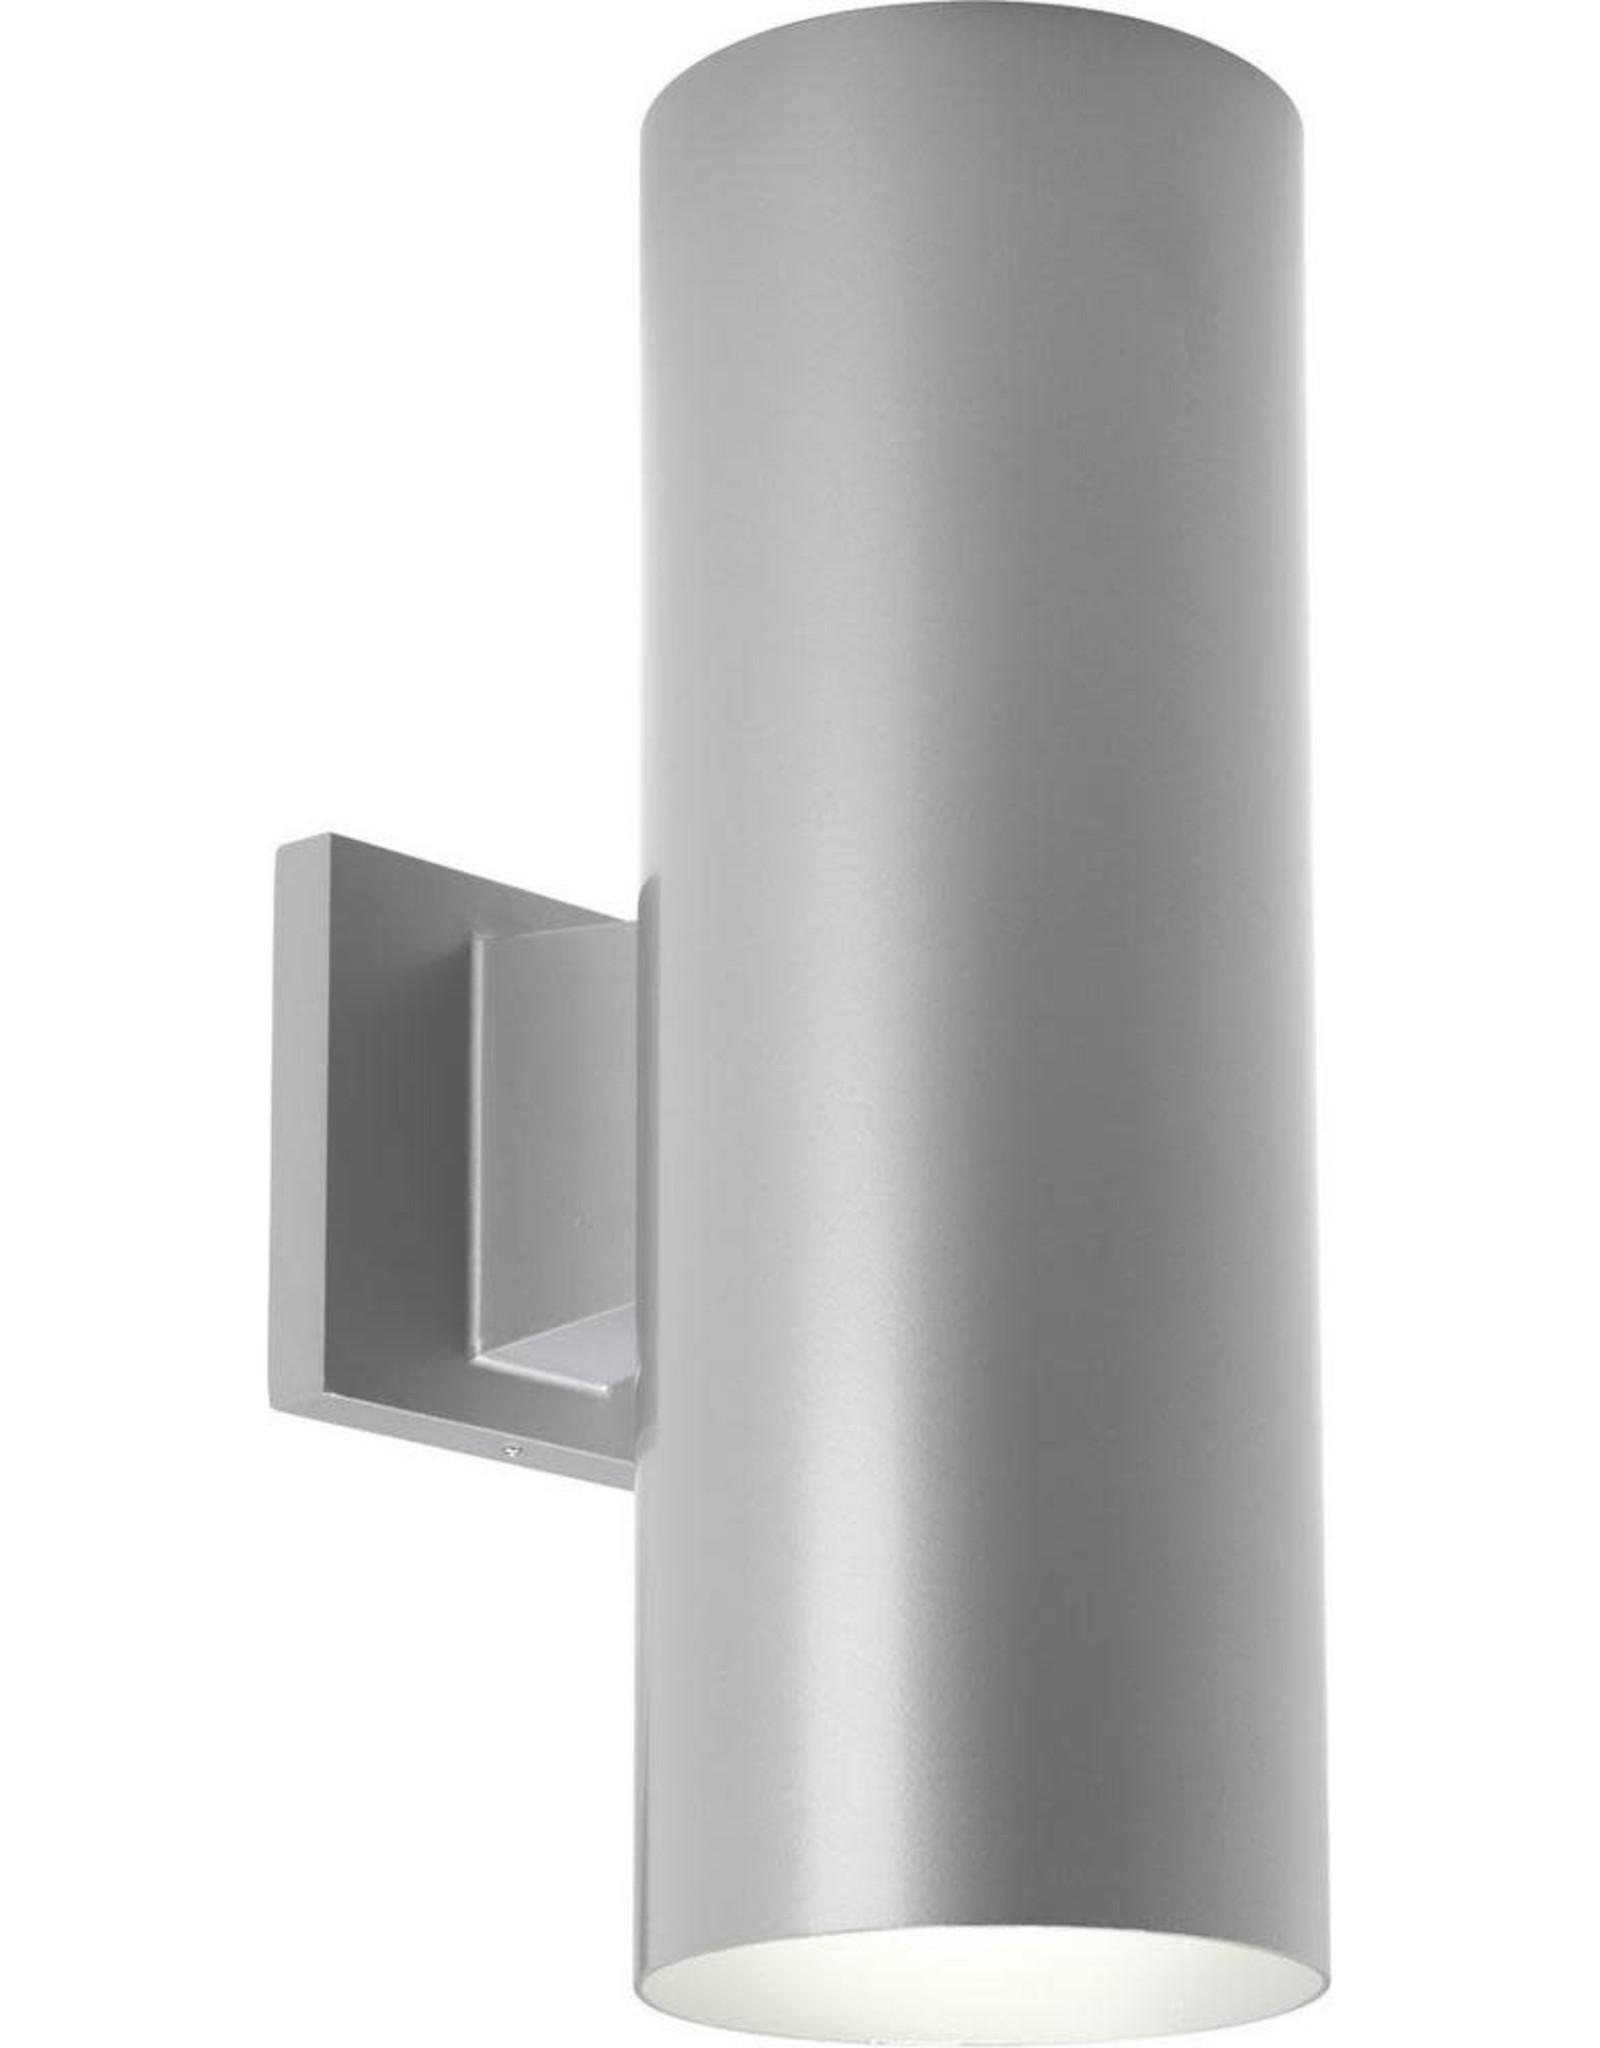 Progress Lighting 2-Light Metallic Gray 14 in. Outdoor Wall Lantern